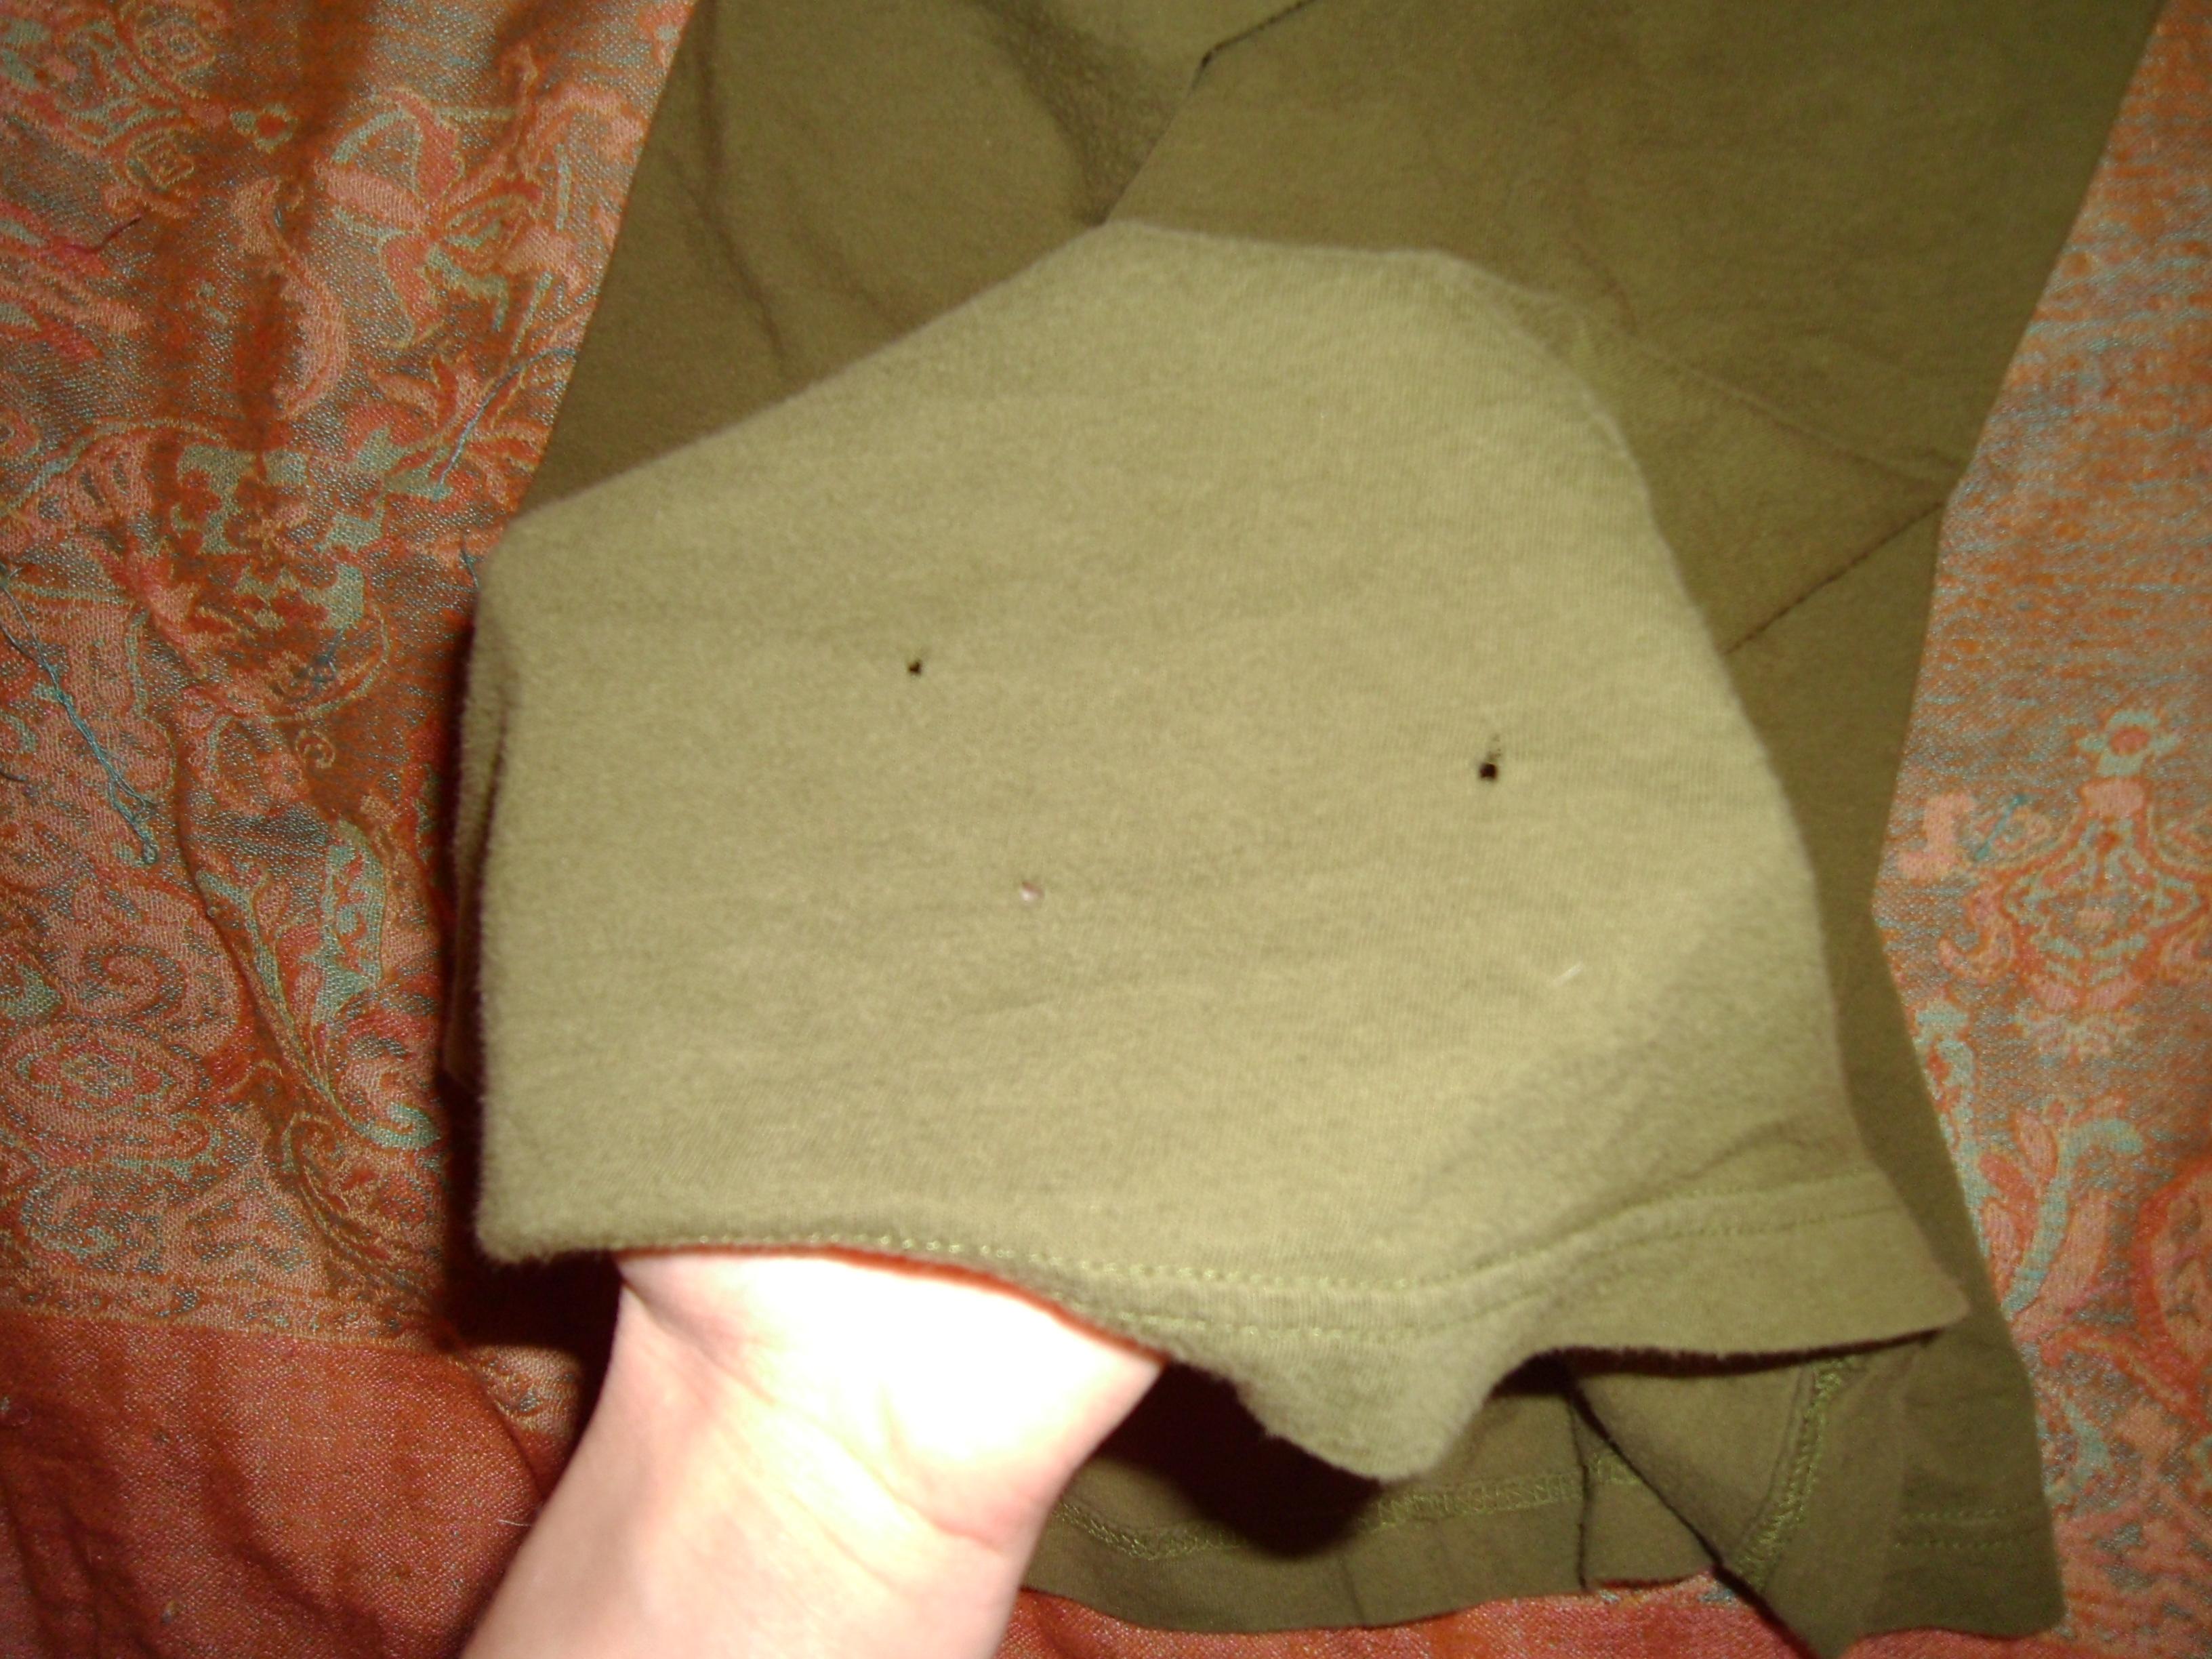 Day 62: Applique Those Holes Away! 3